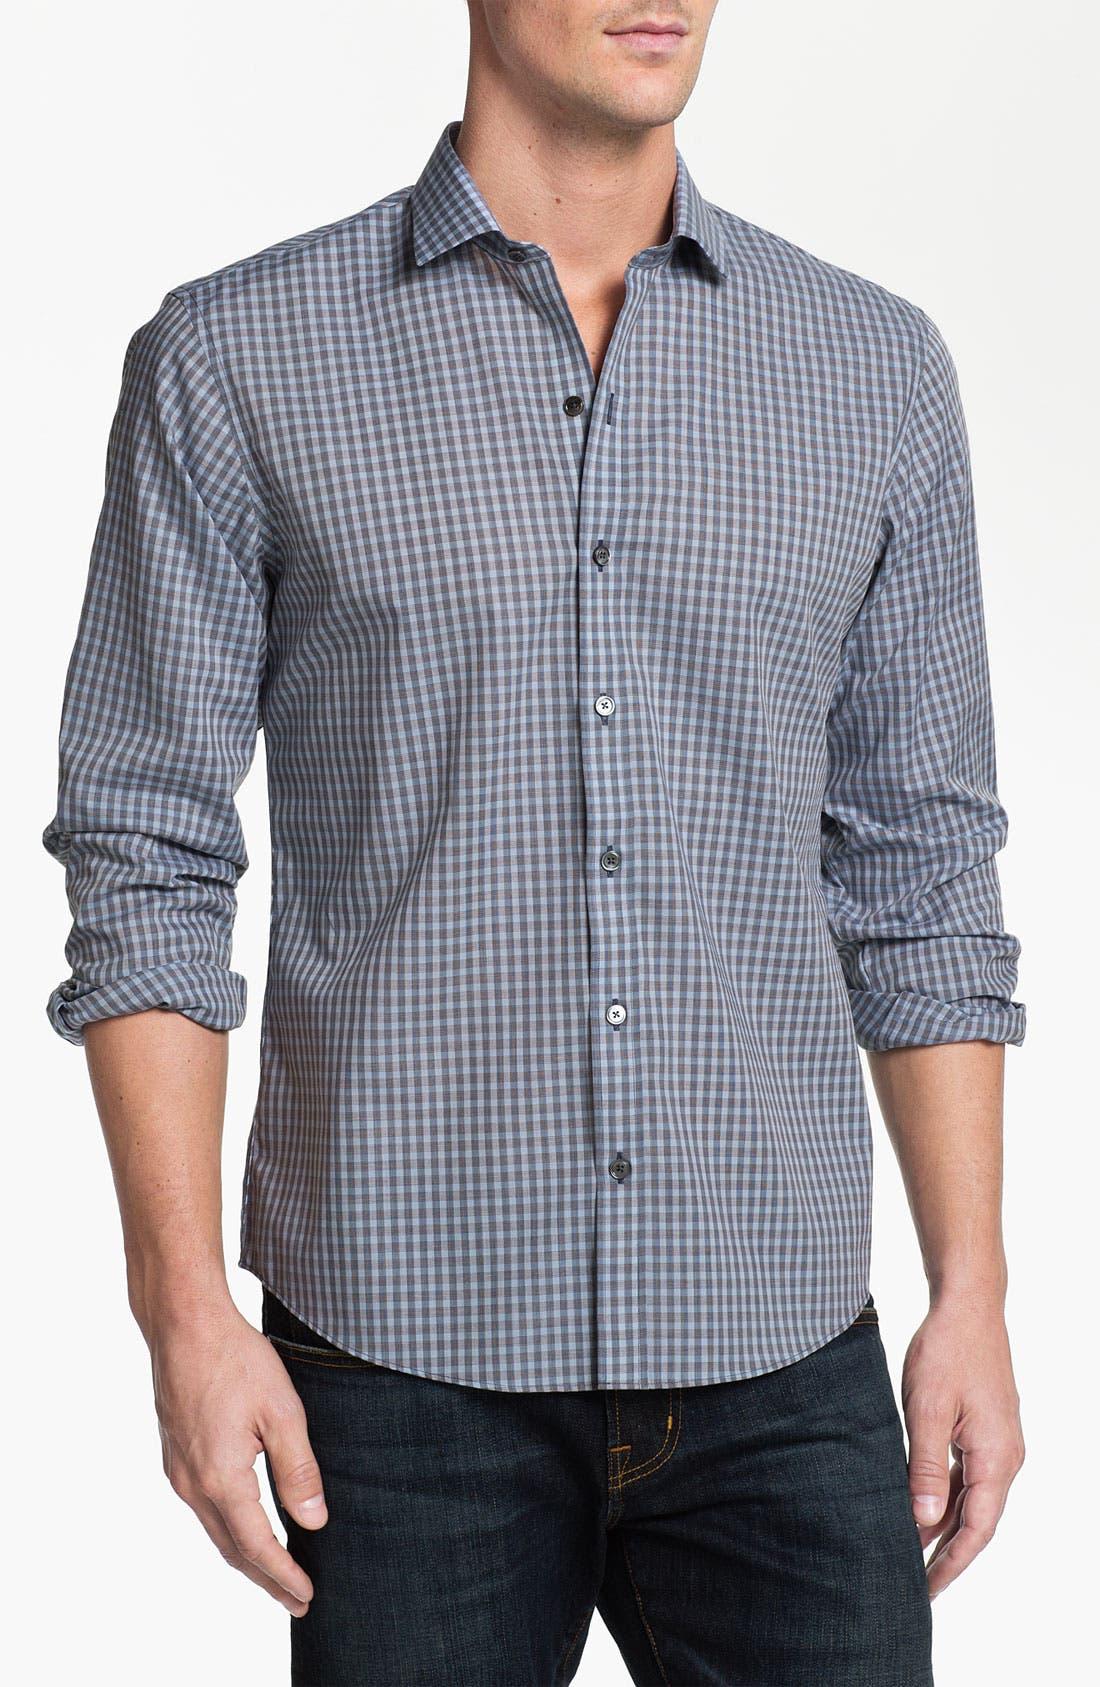 Alternate Image 1 Selected - Zachary Prell 'Jim' Sport Shirt